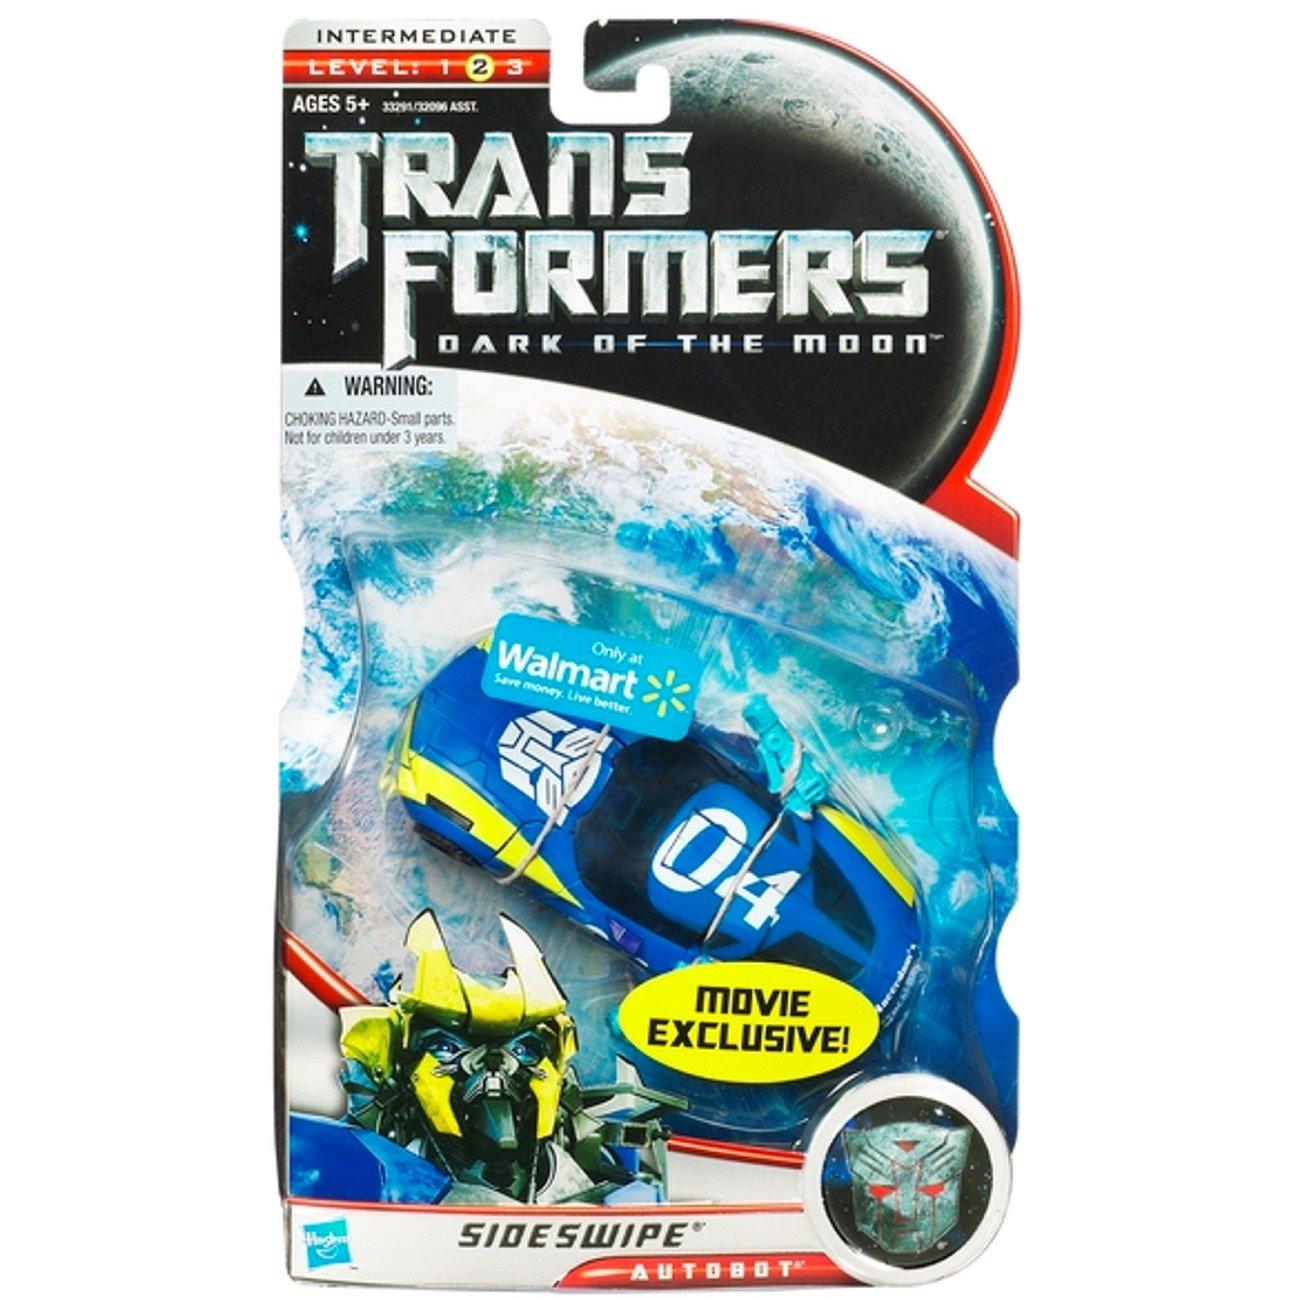 Transformers 3 Dark of the Moon Sideswipe 33291